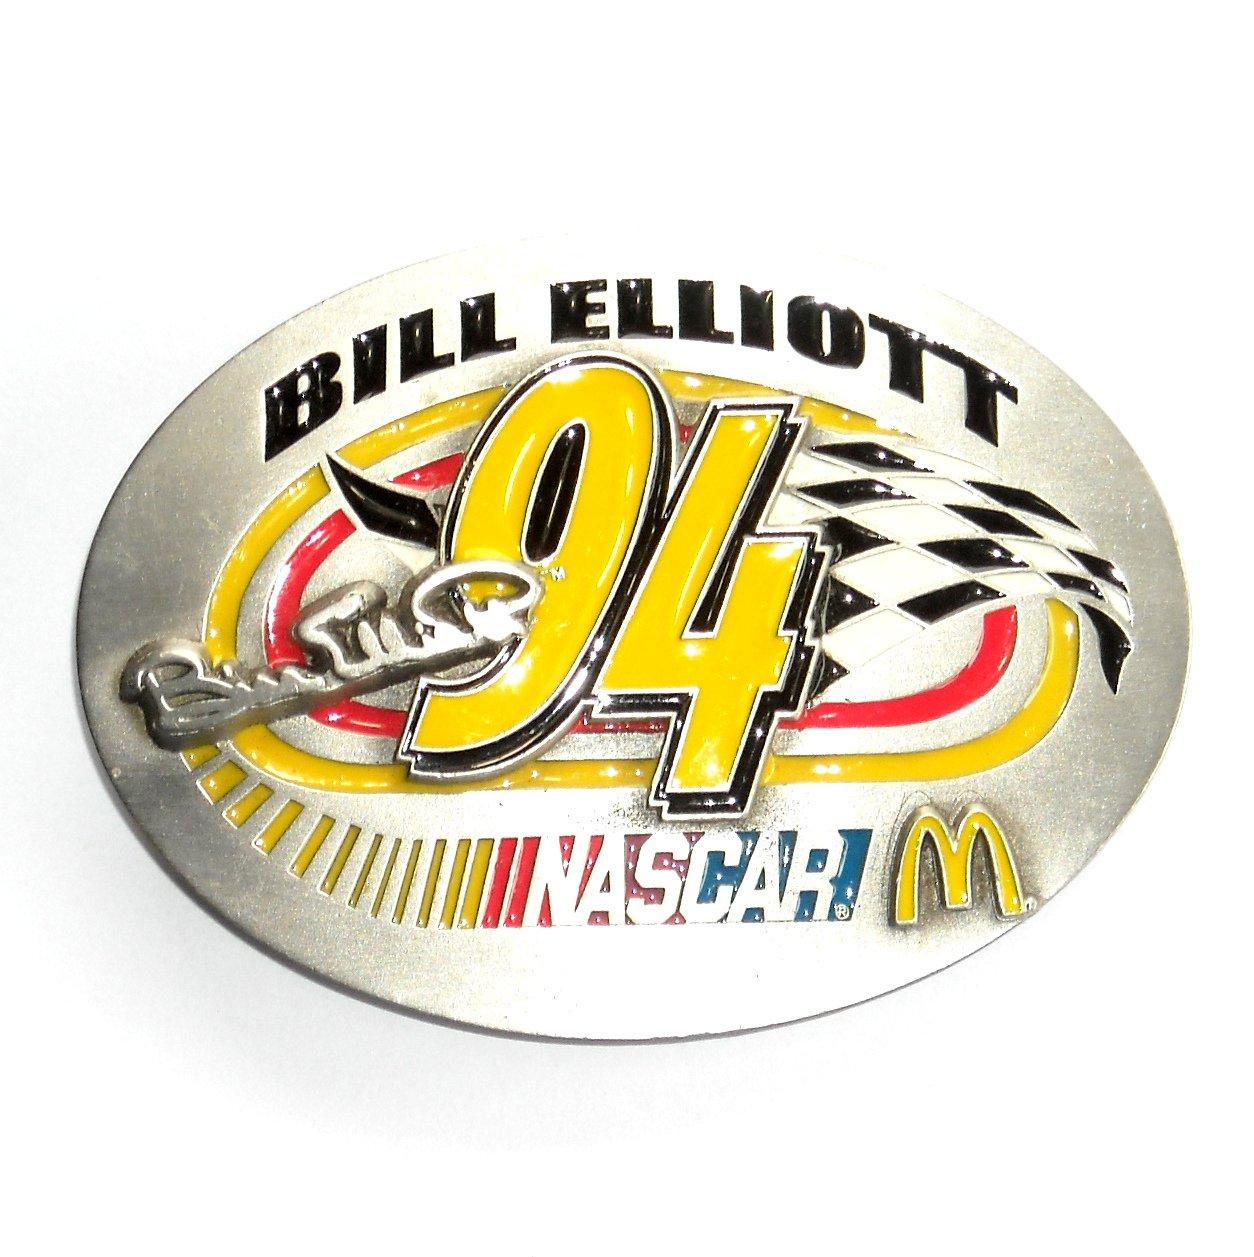 Bill Elliott Nascar 94 Great American Limited Edition Belt Buckle